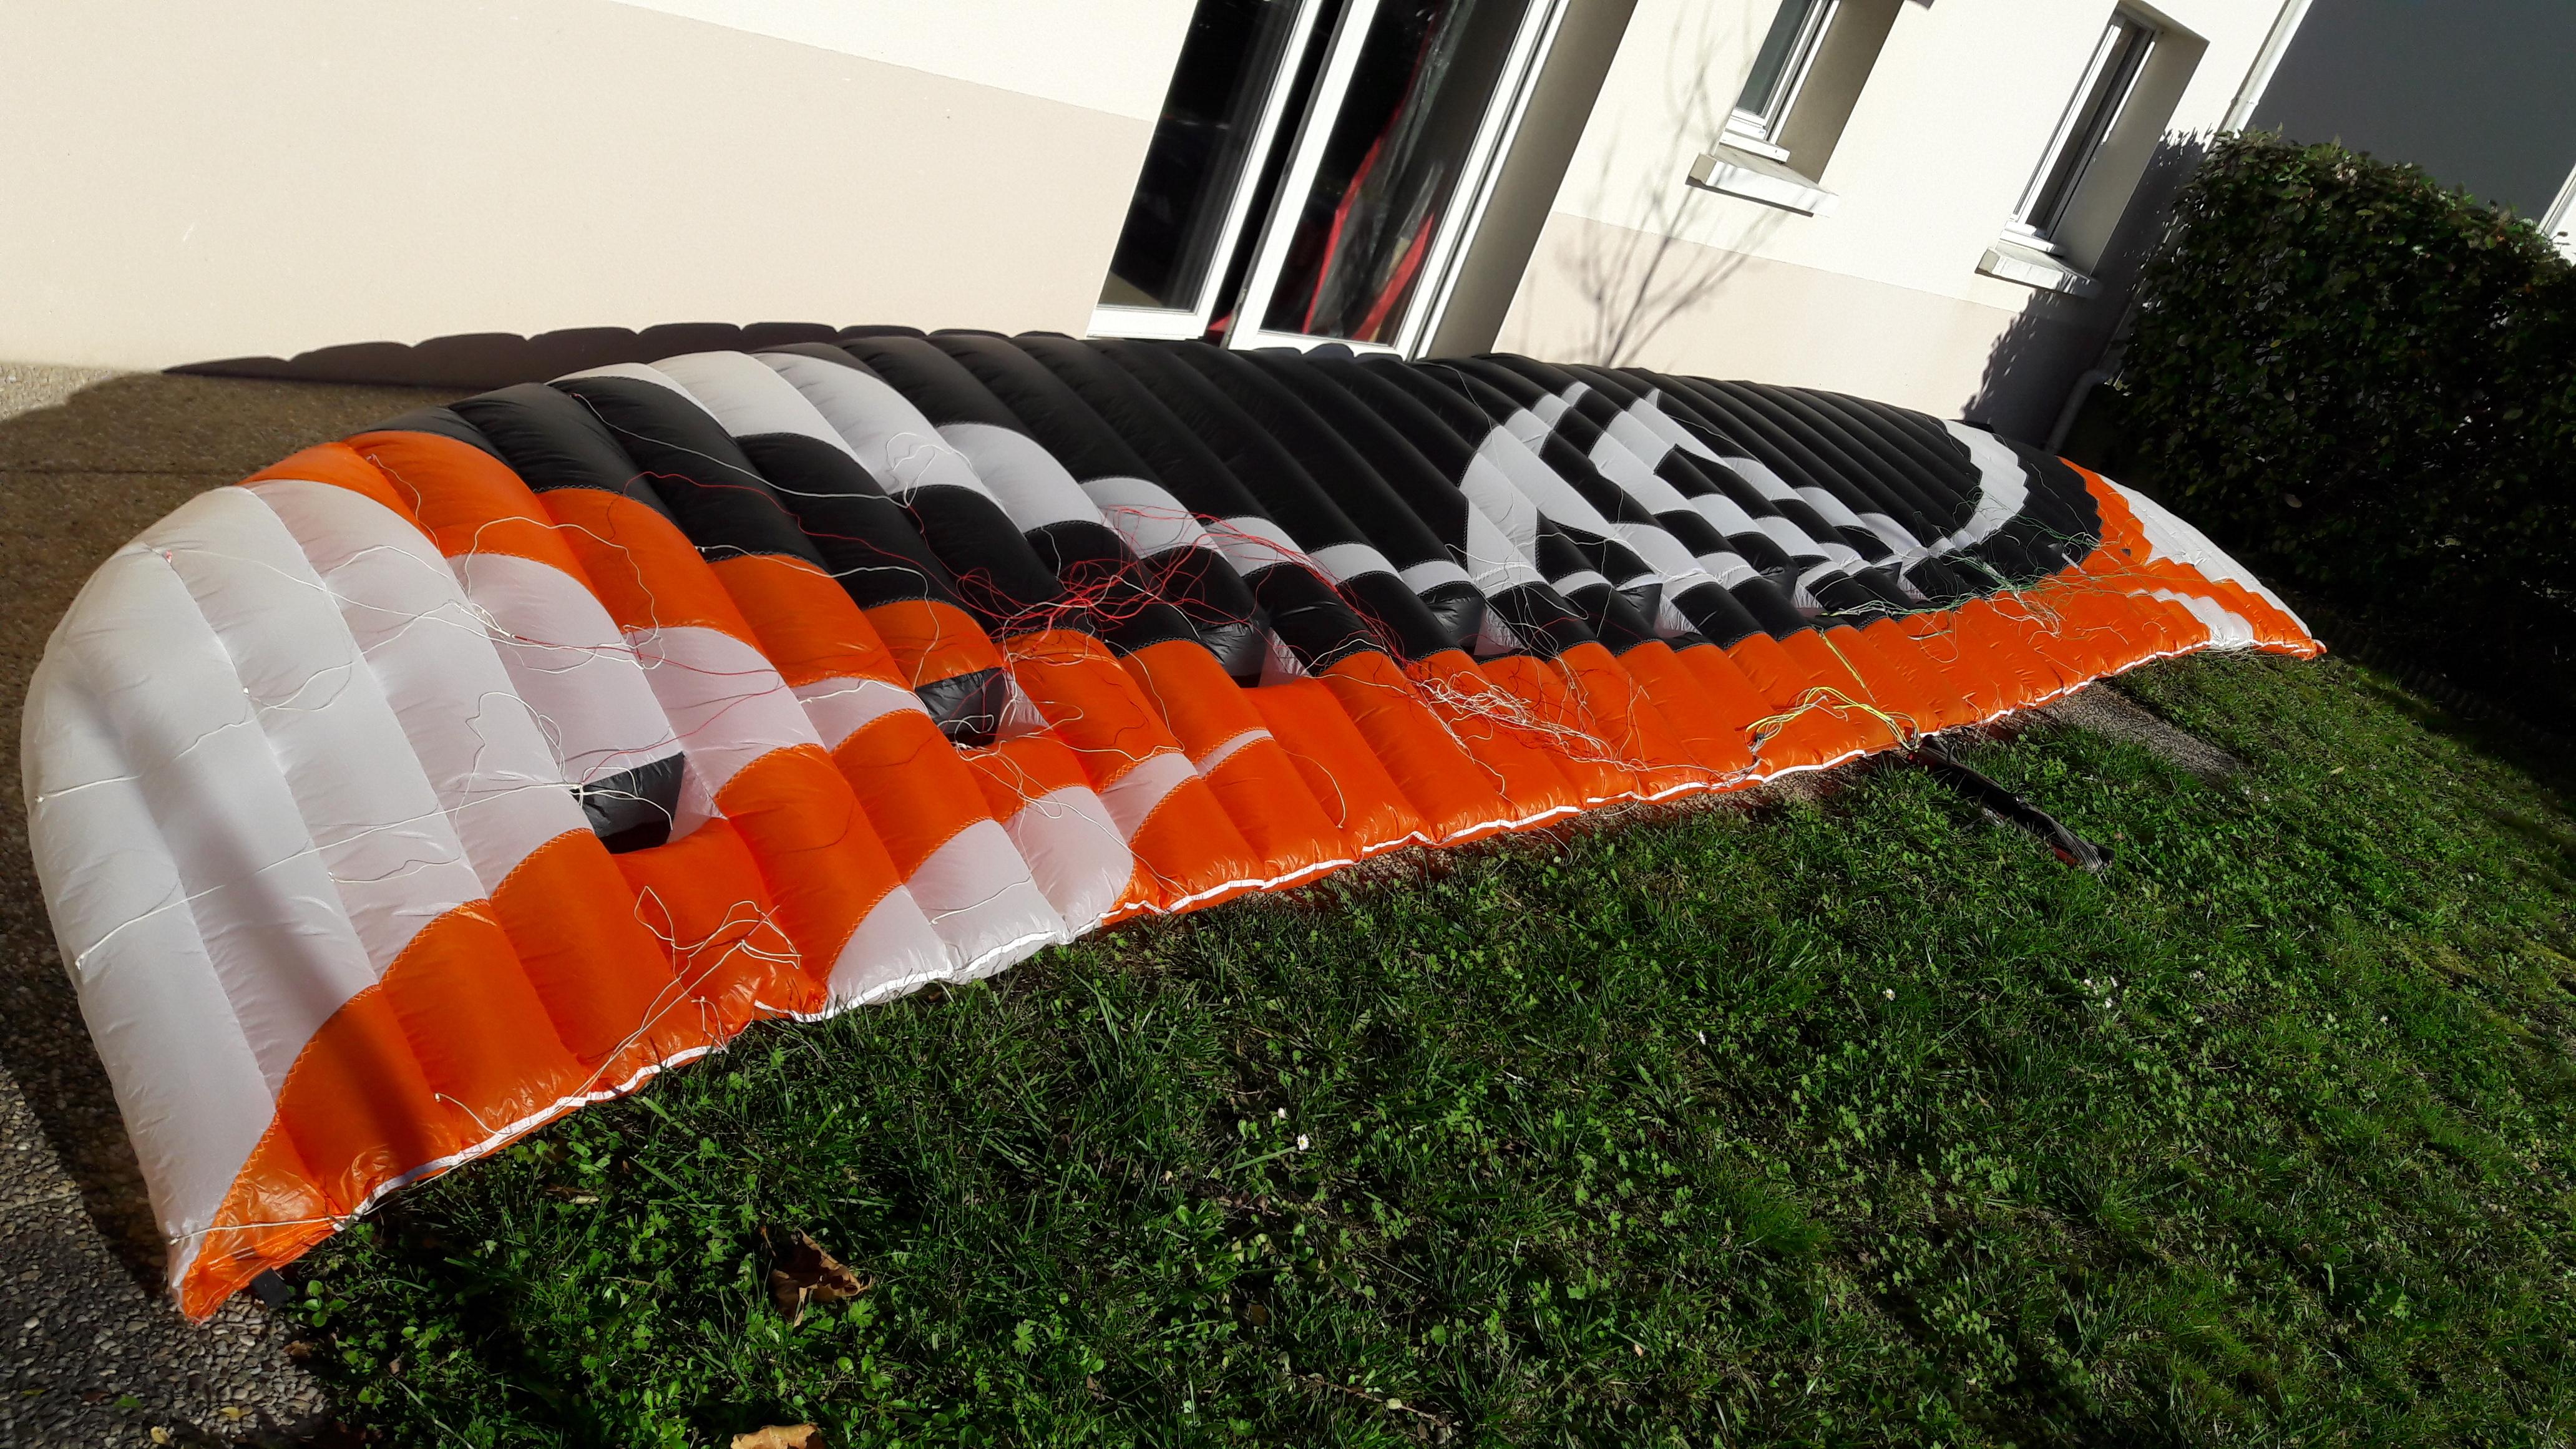 [VENDUE] Flysurfer speed4 lotus LIMITED EDITION 15m² - 1100e 81857320171125120643